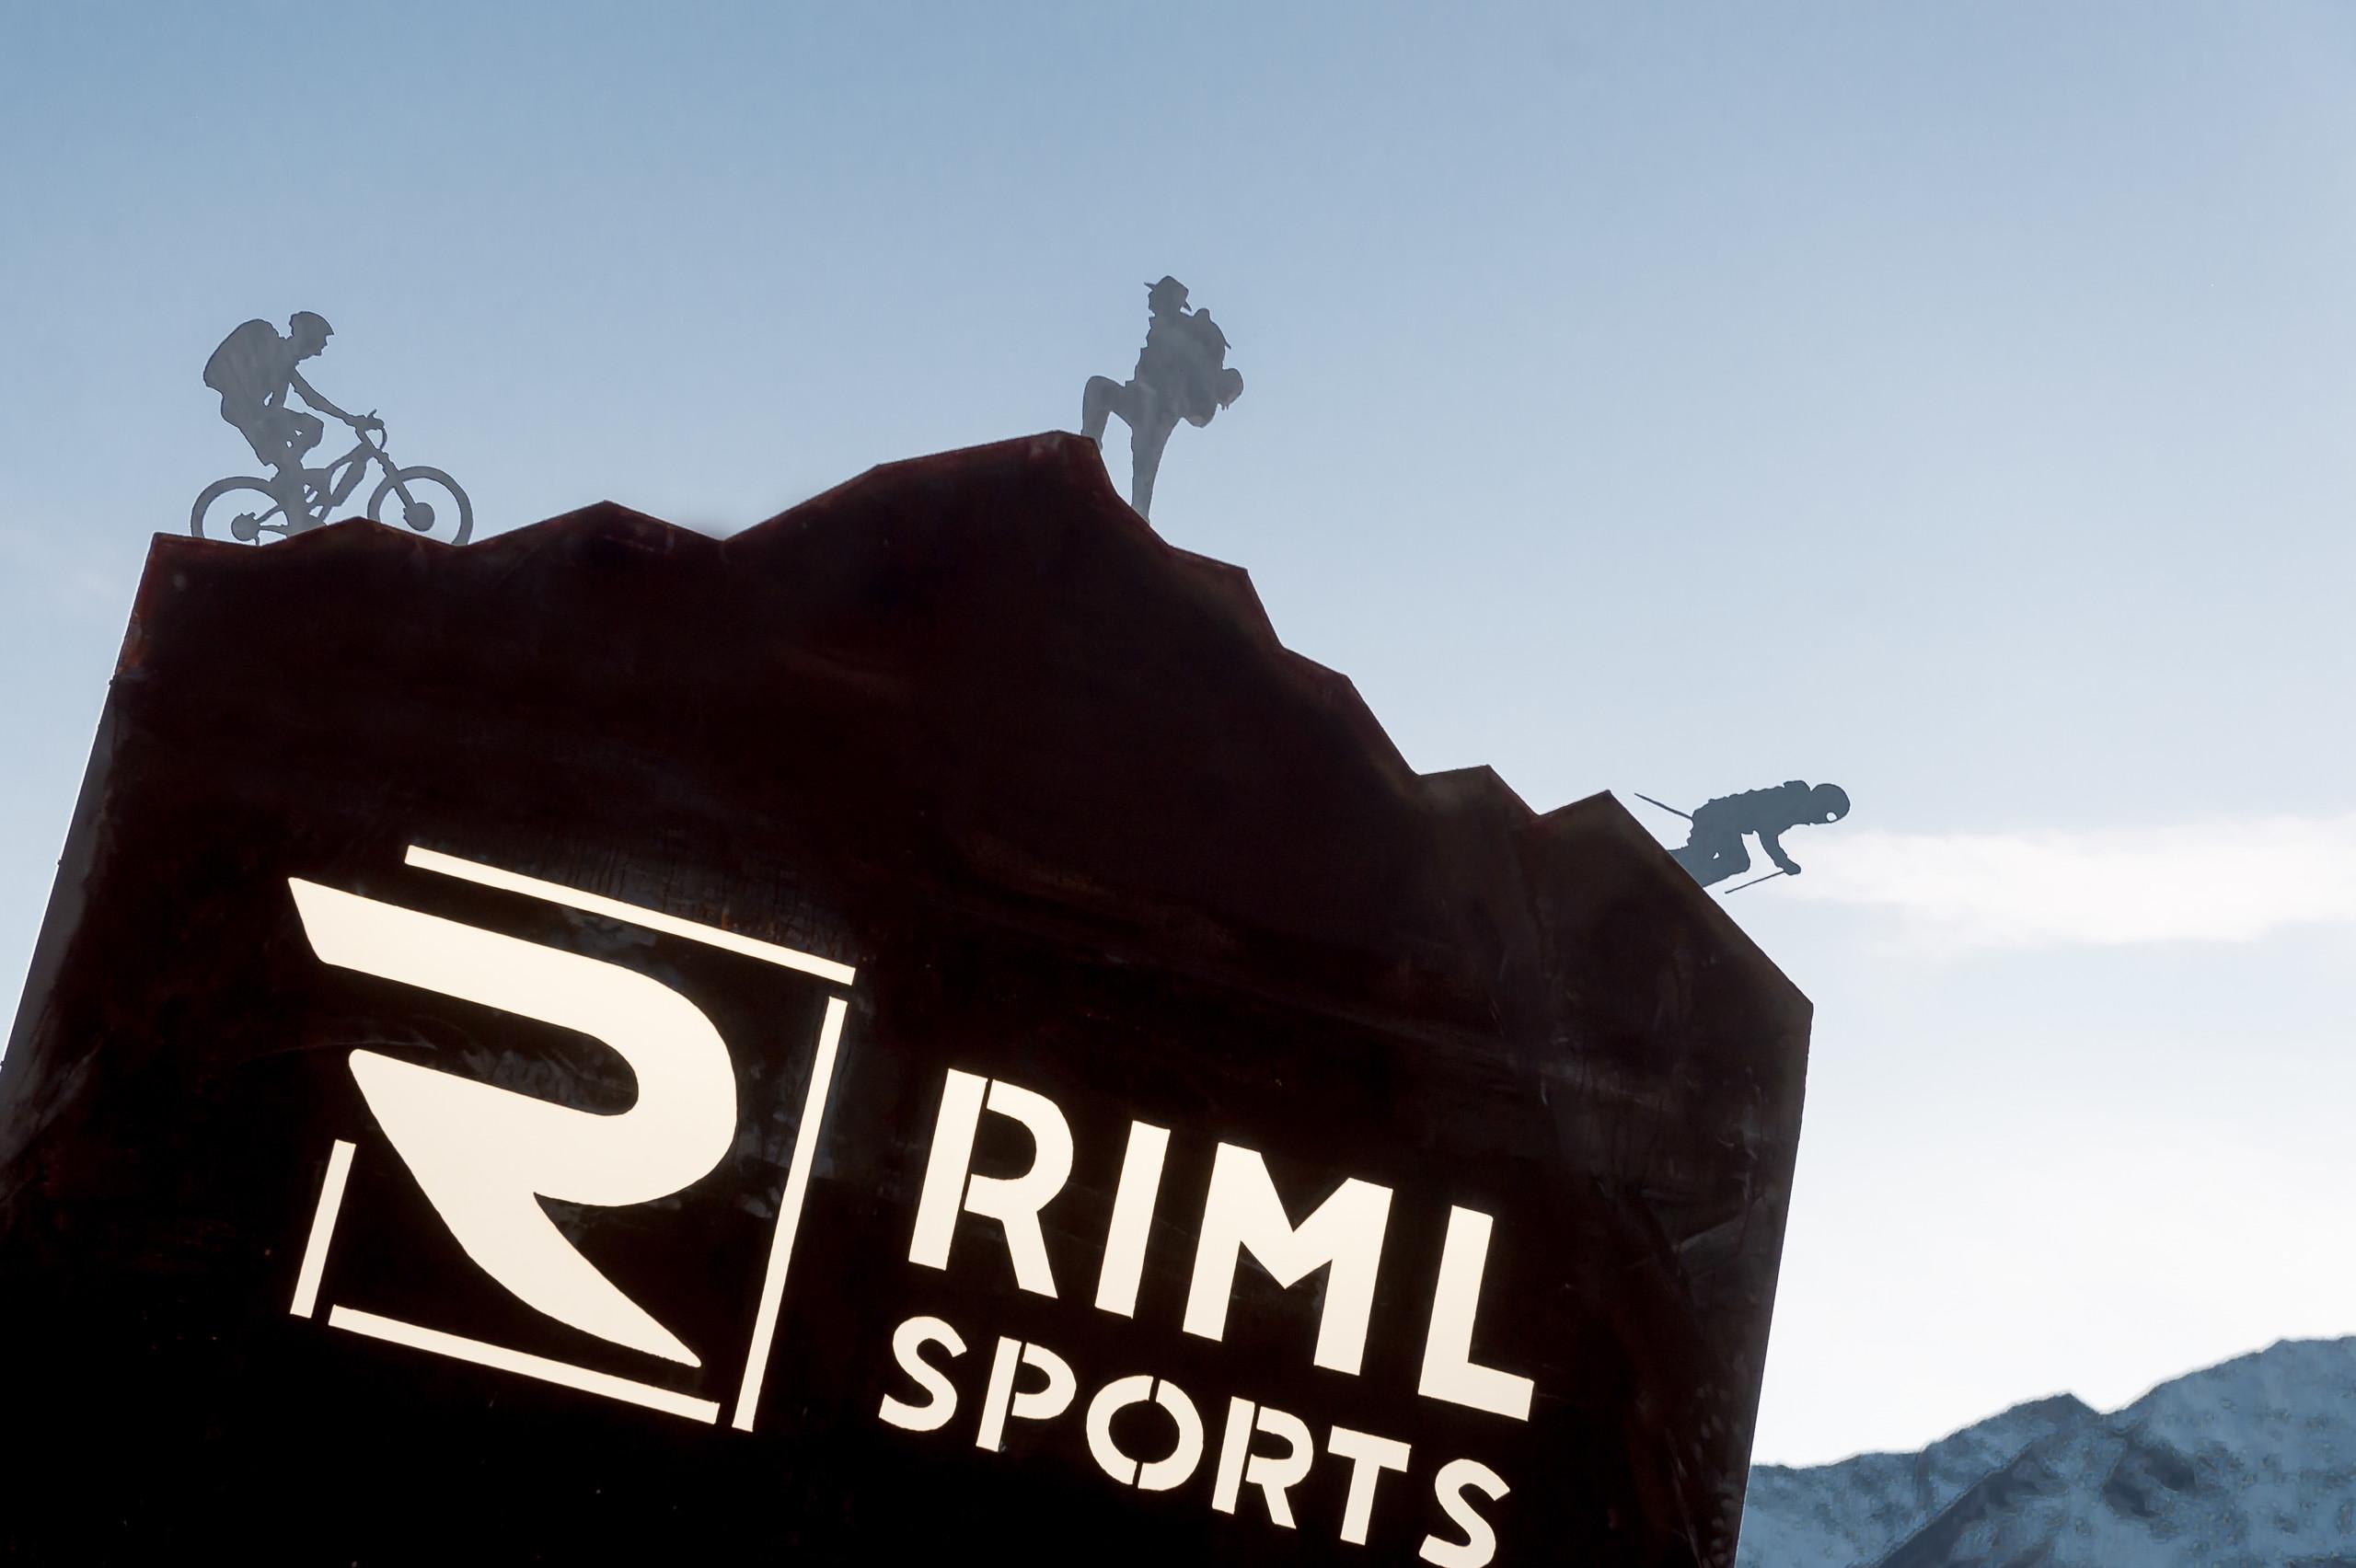 info for 1e420 c8d10 Outdoor Equipment & Fashion Shop in Längenfeld, Tyrol : Riml ...